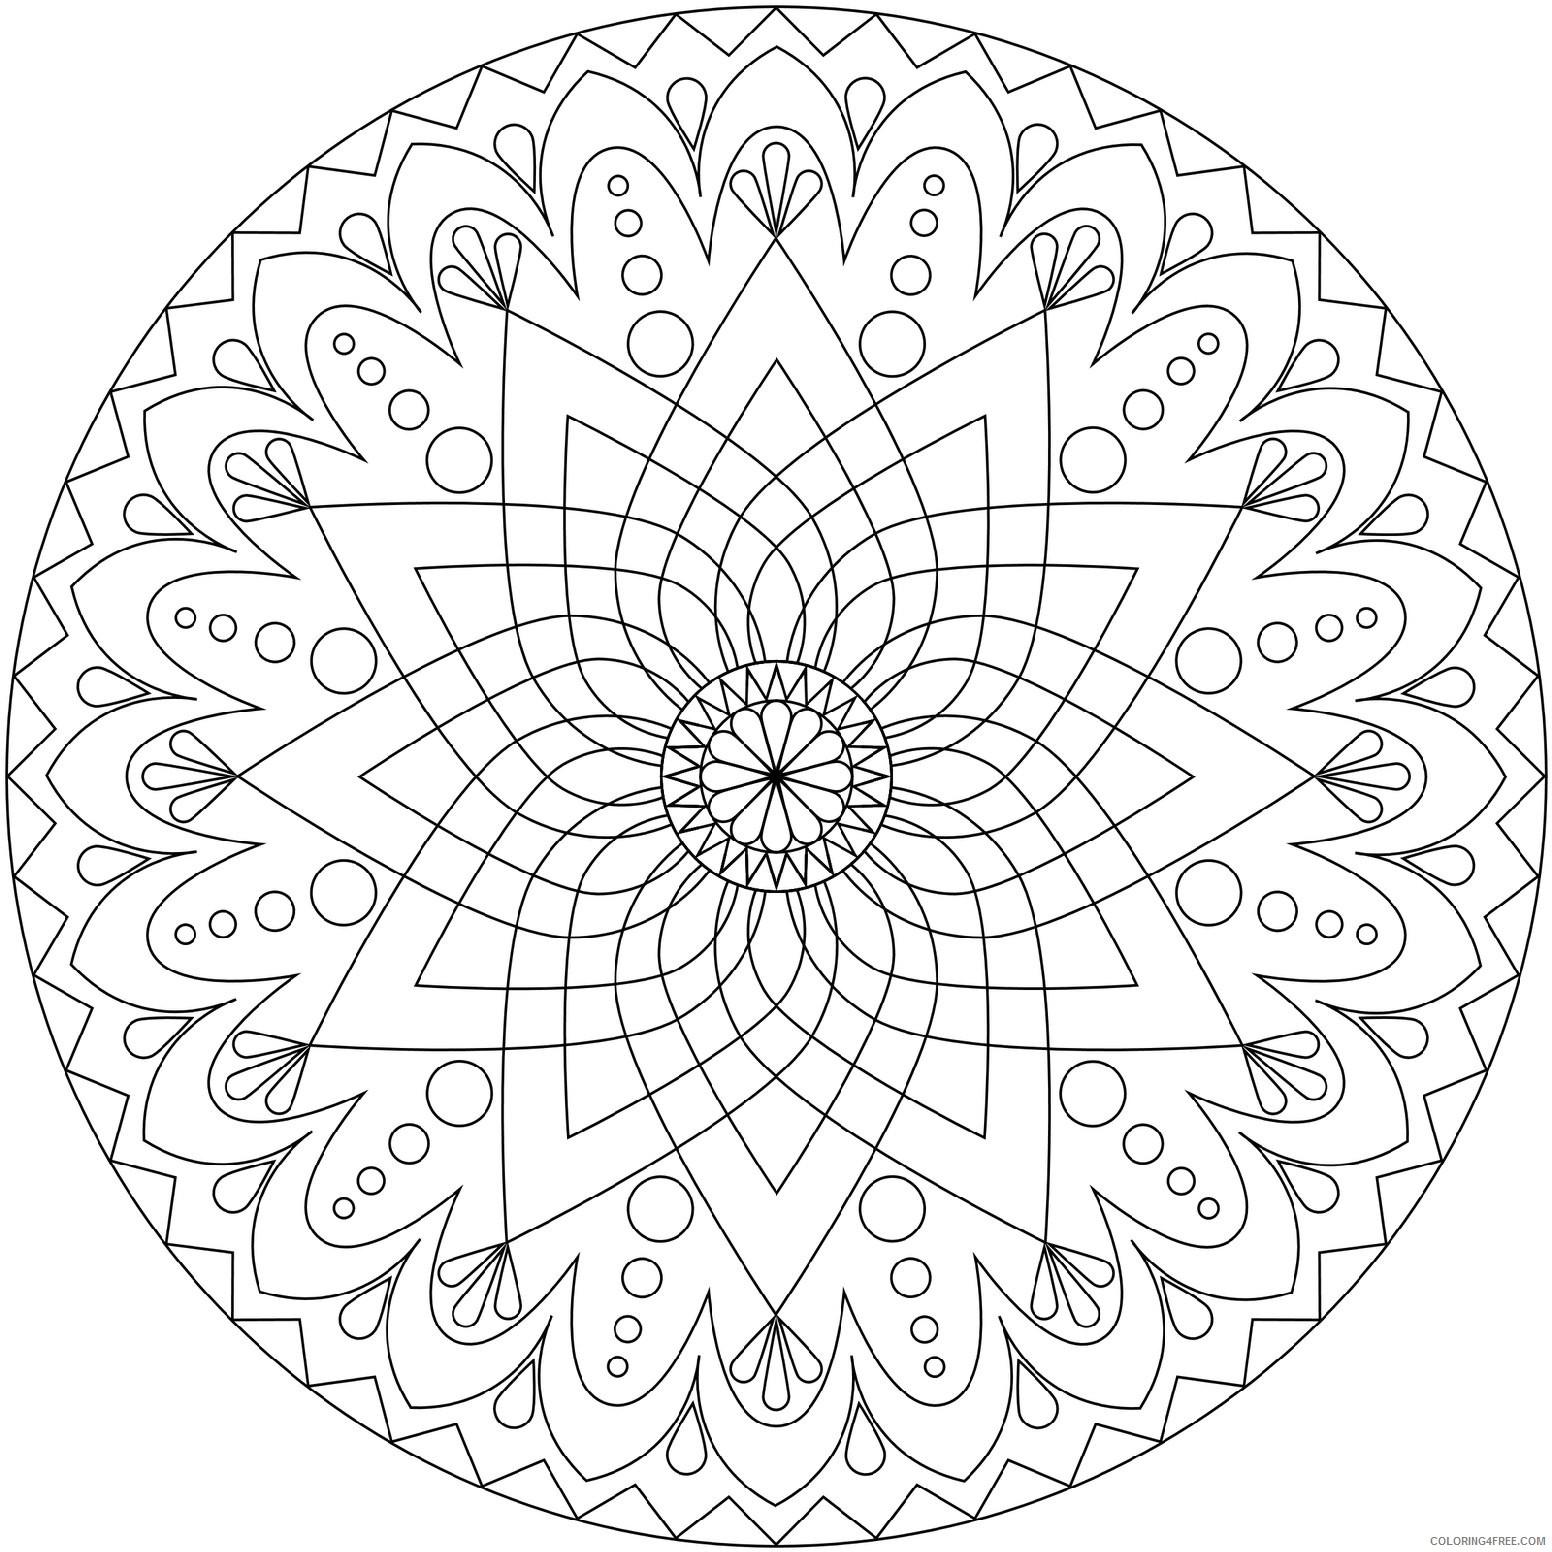 Circled Mandala Coloring Pages Printable Coloring4free Coloring4free Com